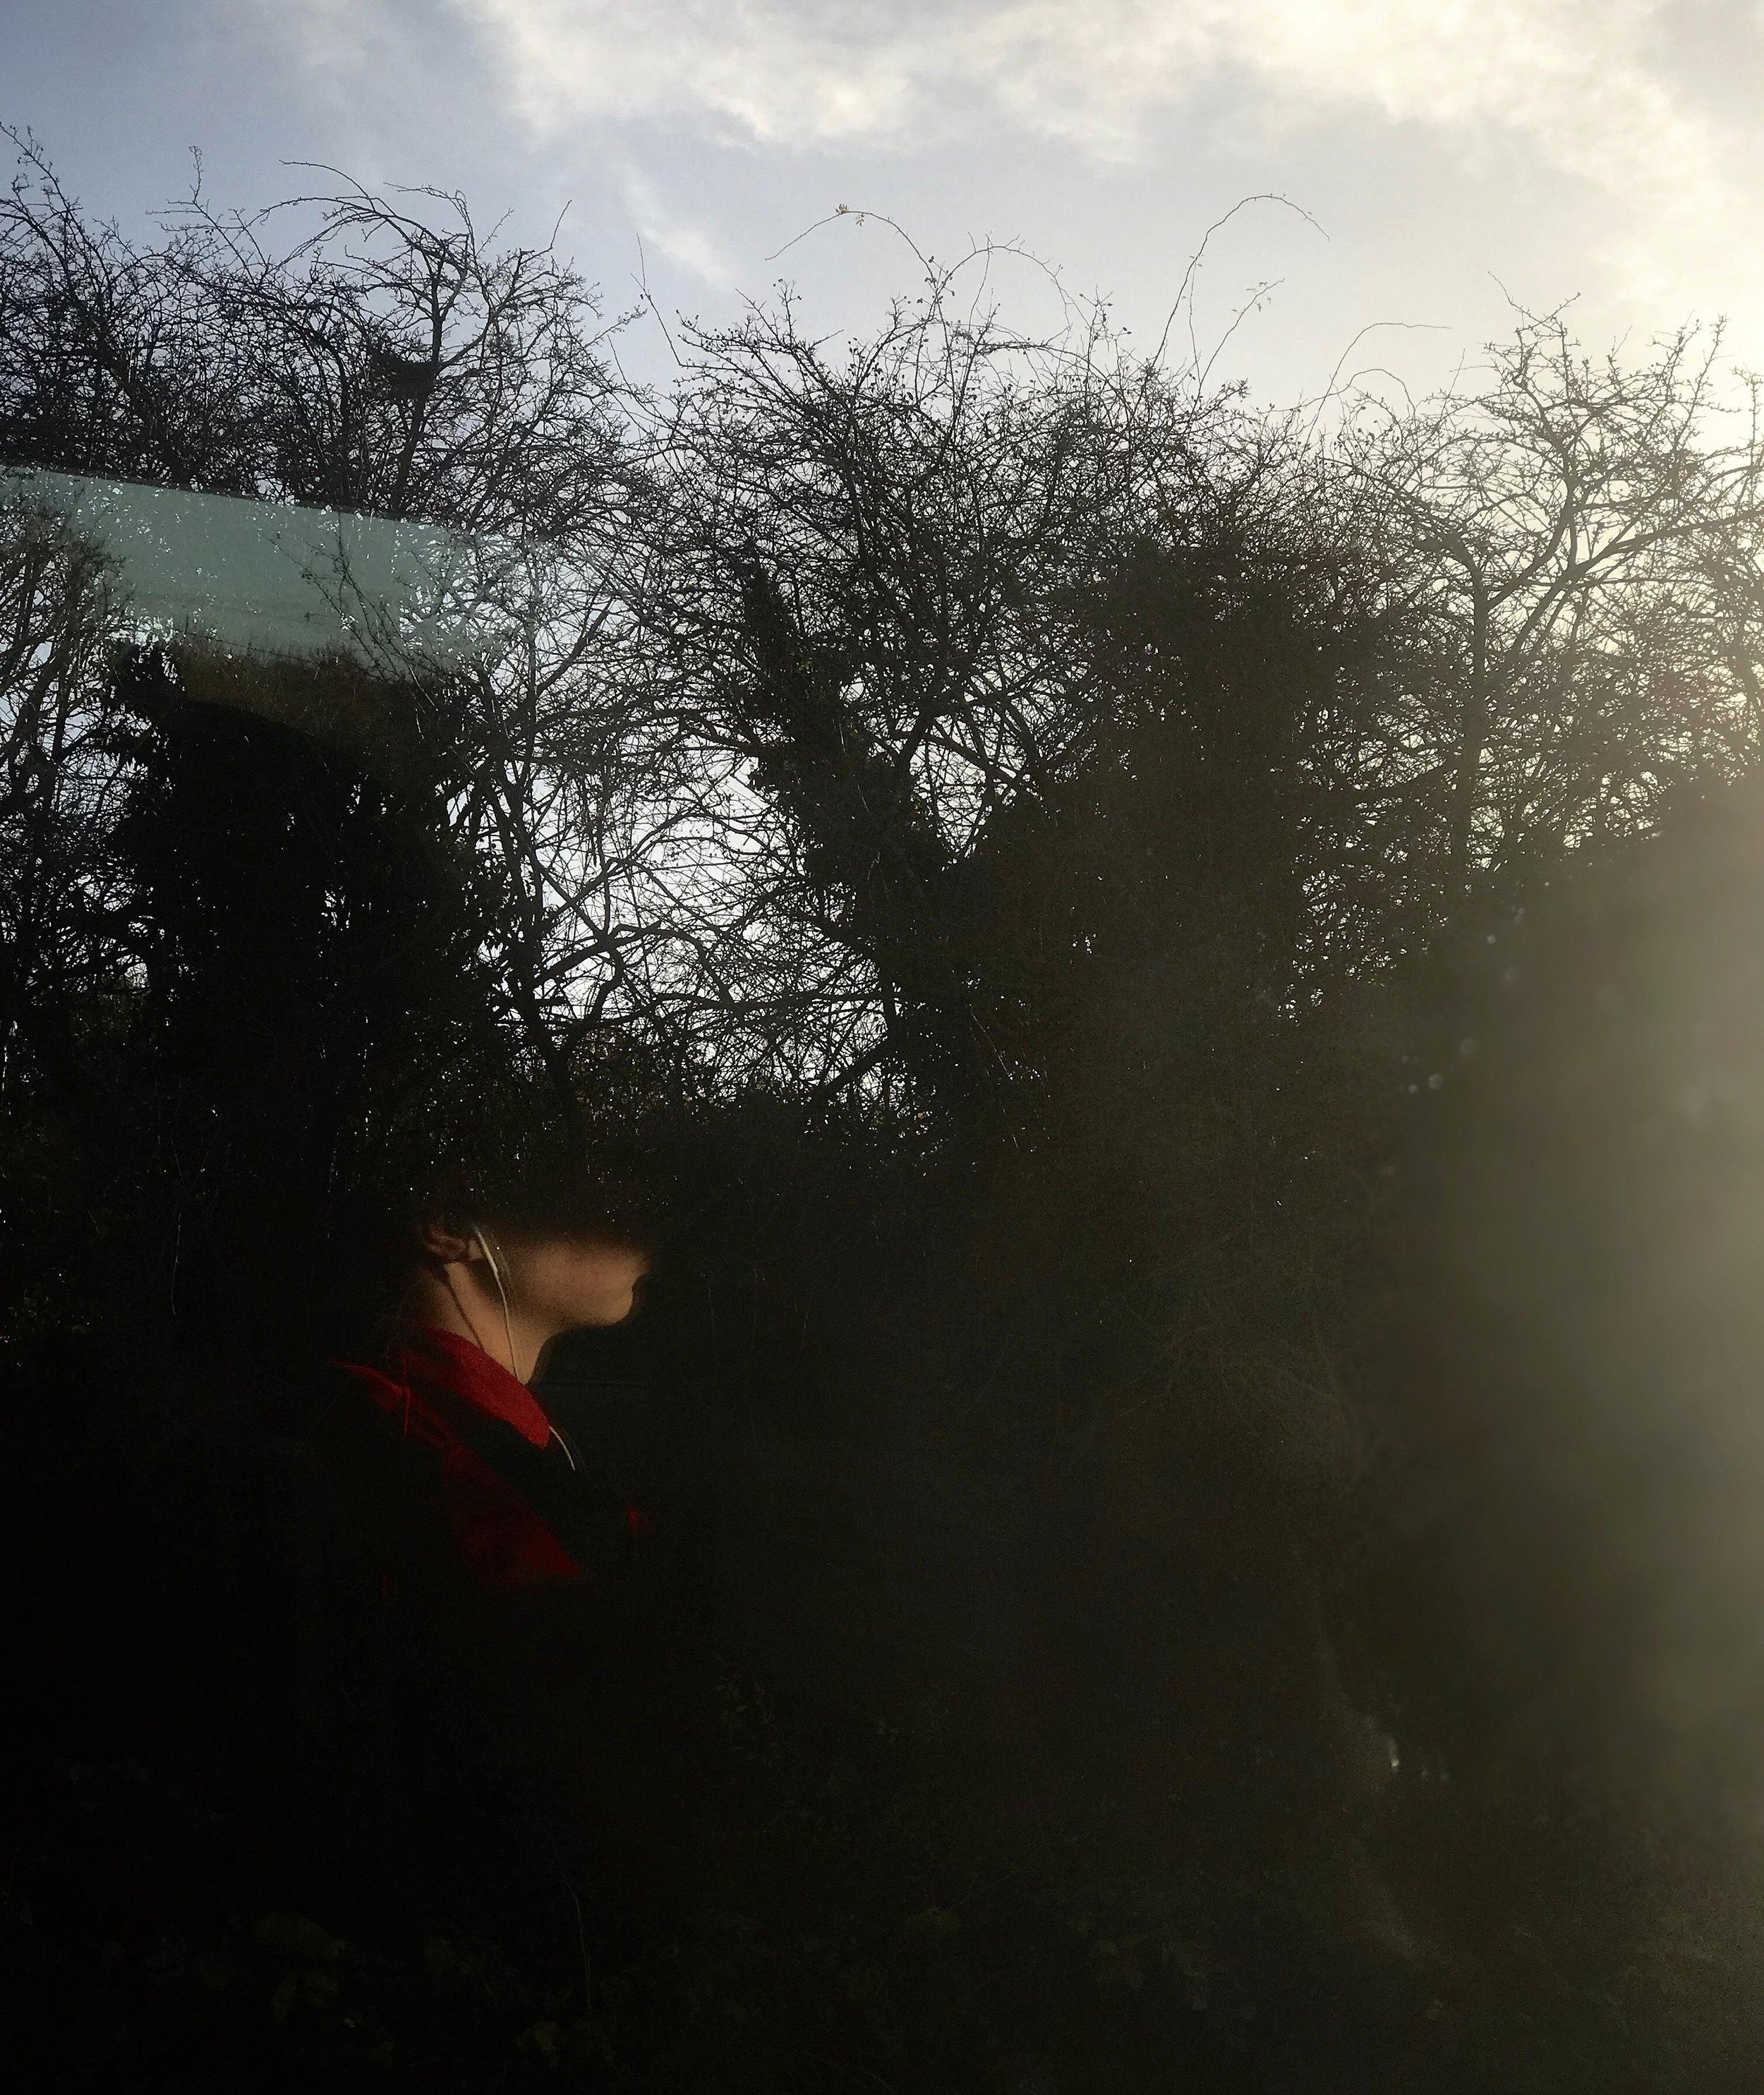 Train_Cardiff_Head_Trees.jpg